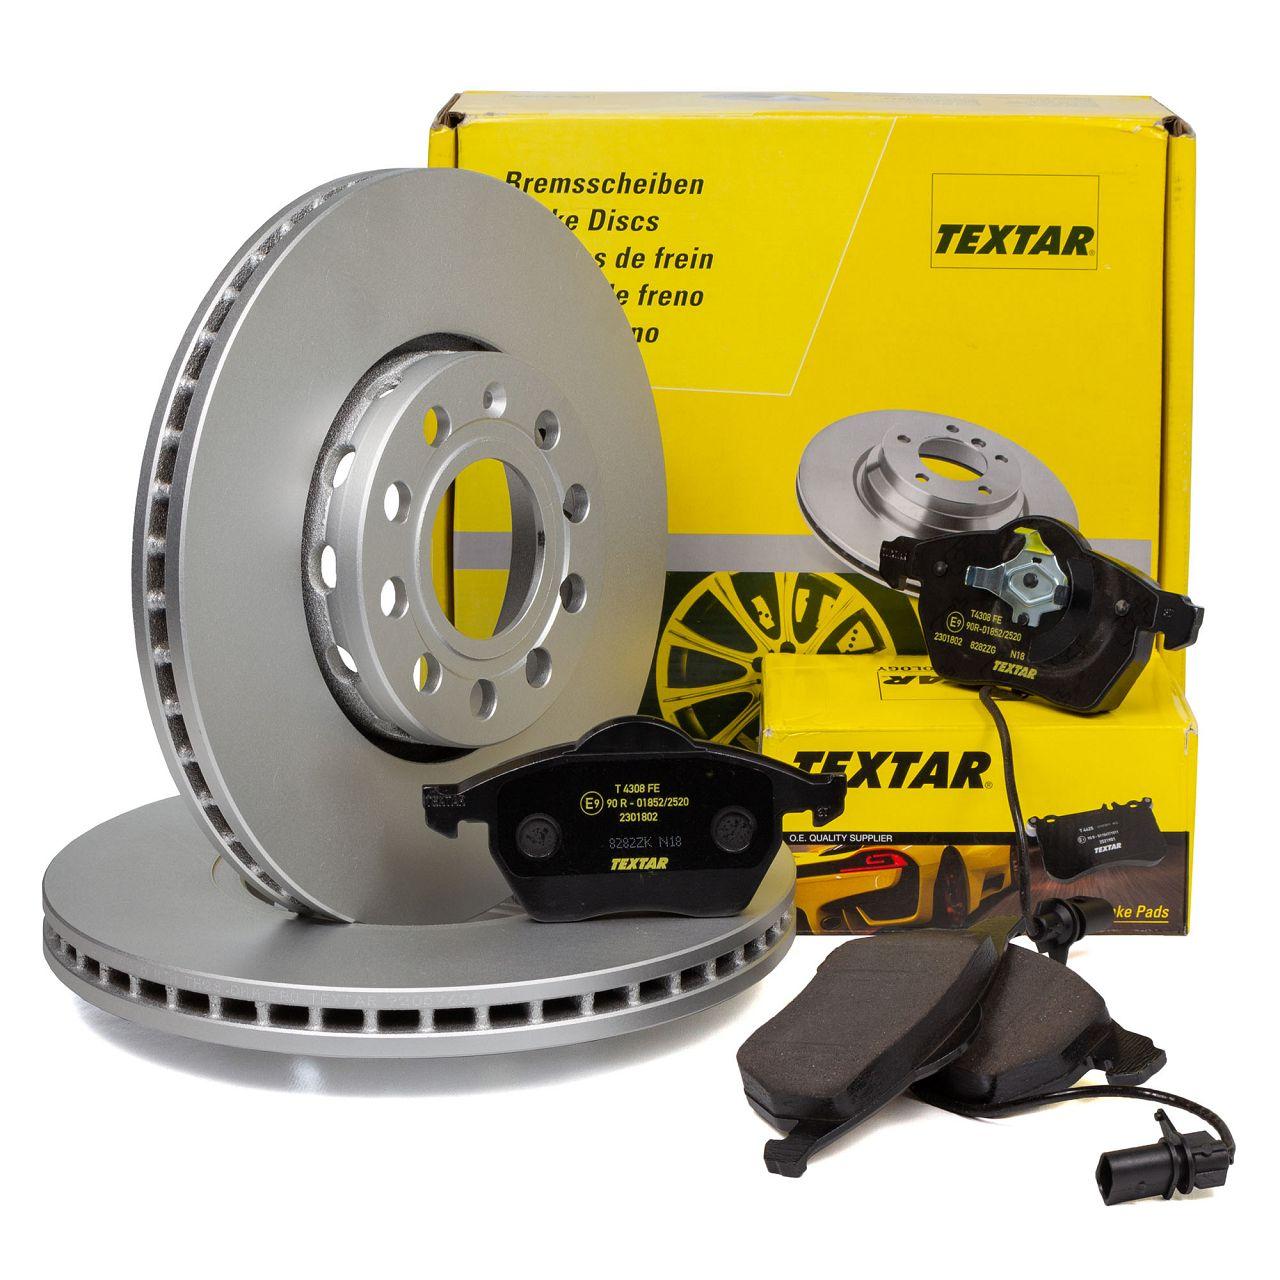 TEXTAR Bremsscheiben + Beläge + Wako AUDI A4 B6 B7 A6 C5 SEAT Exeo VW Passat B5 vorne